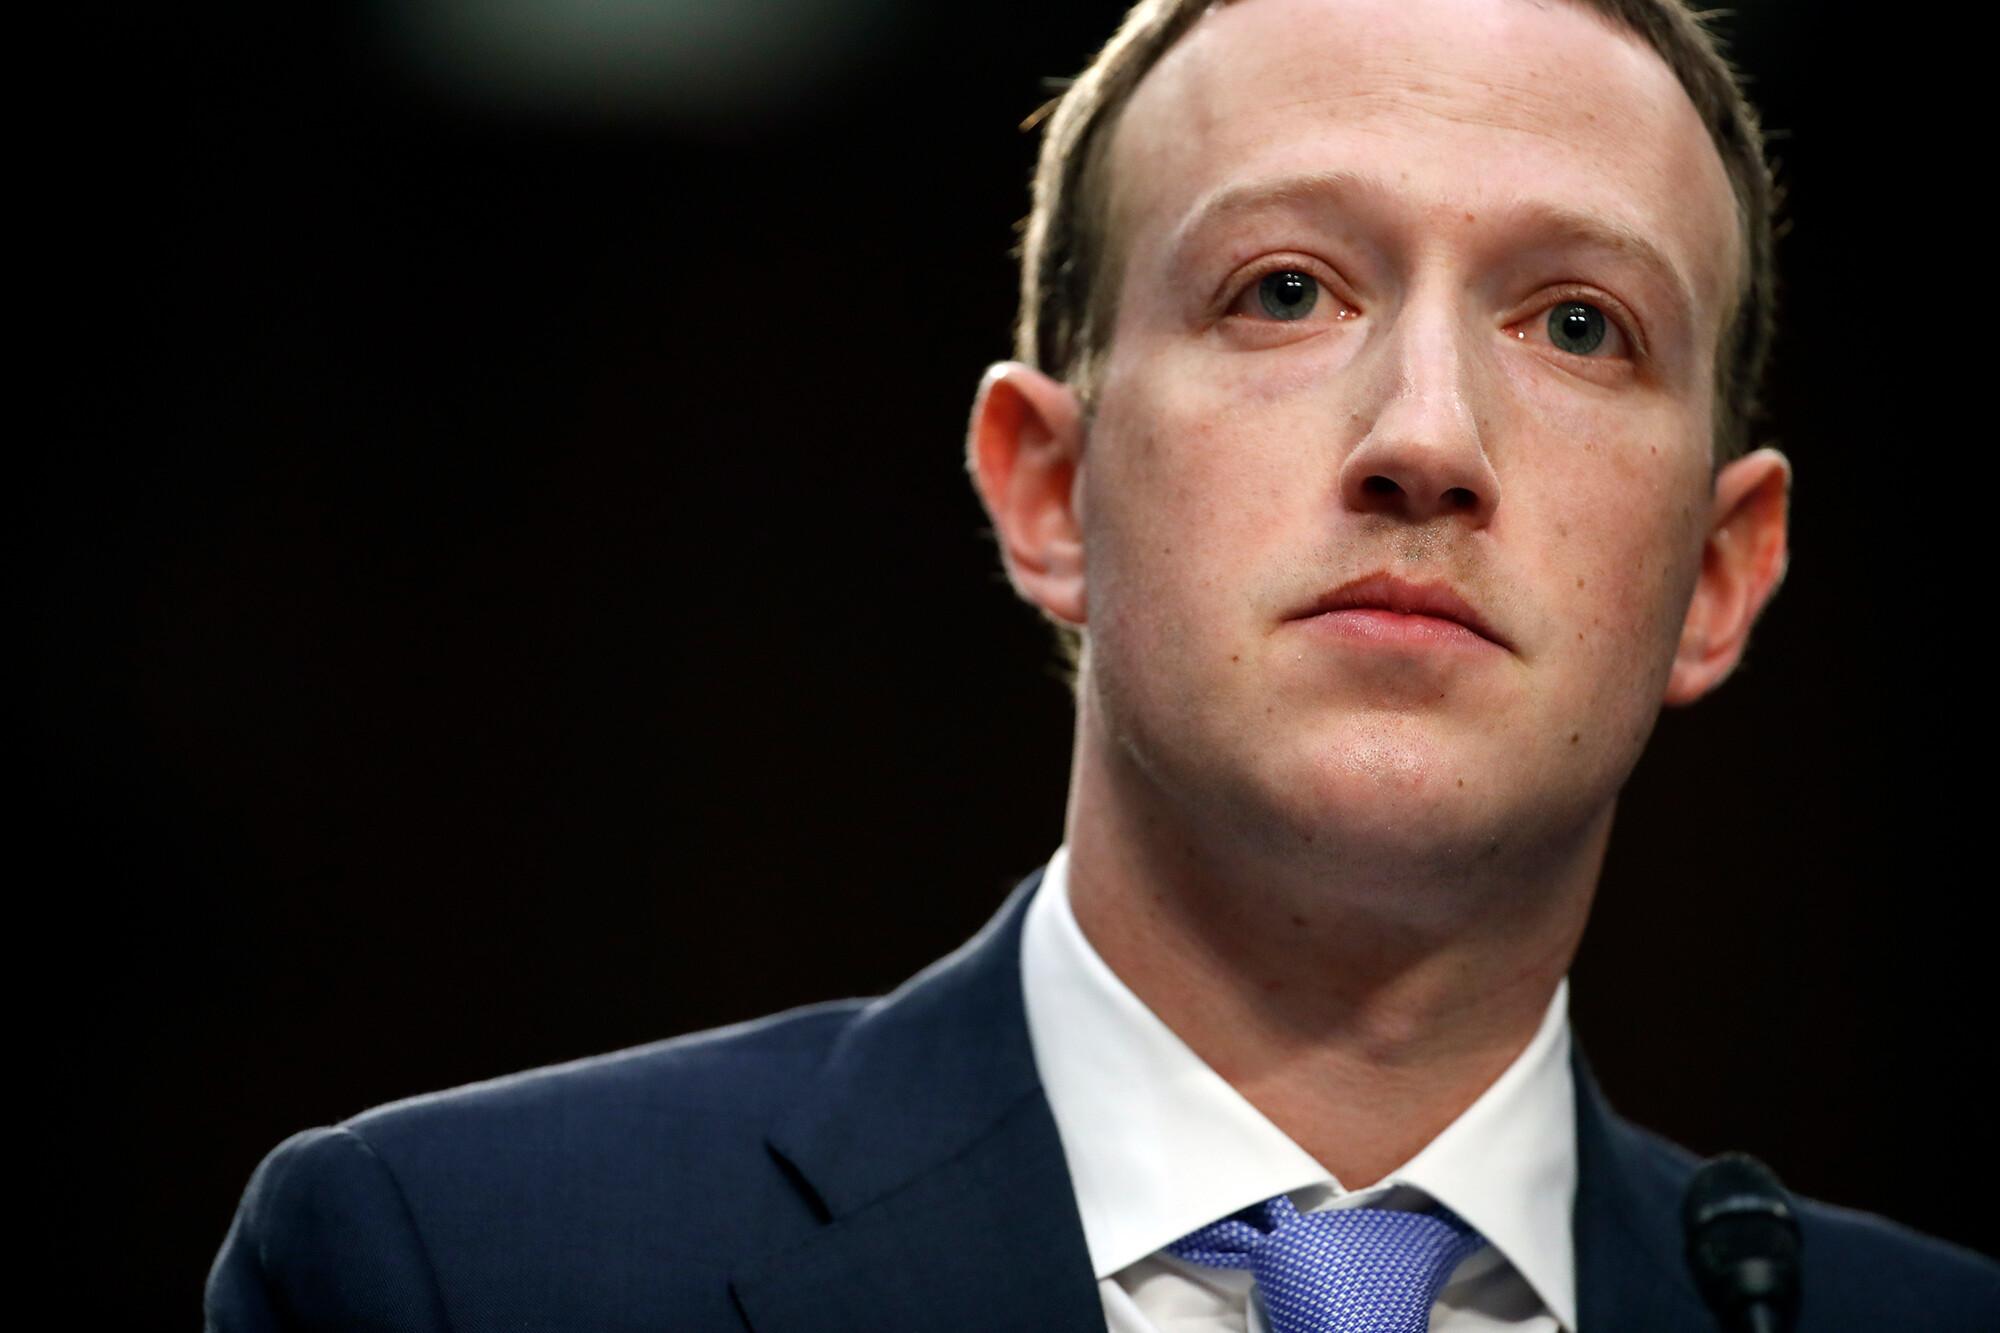 Former Zuckerberg adviser: Facebook's problem is its business model